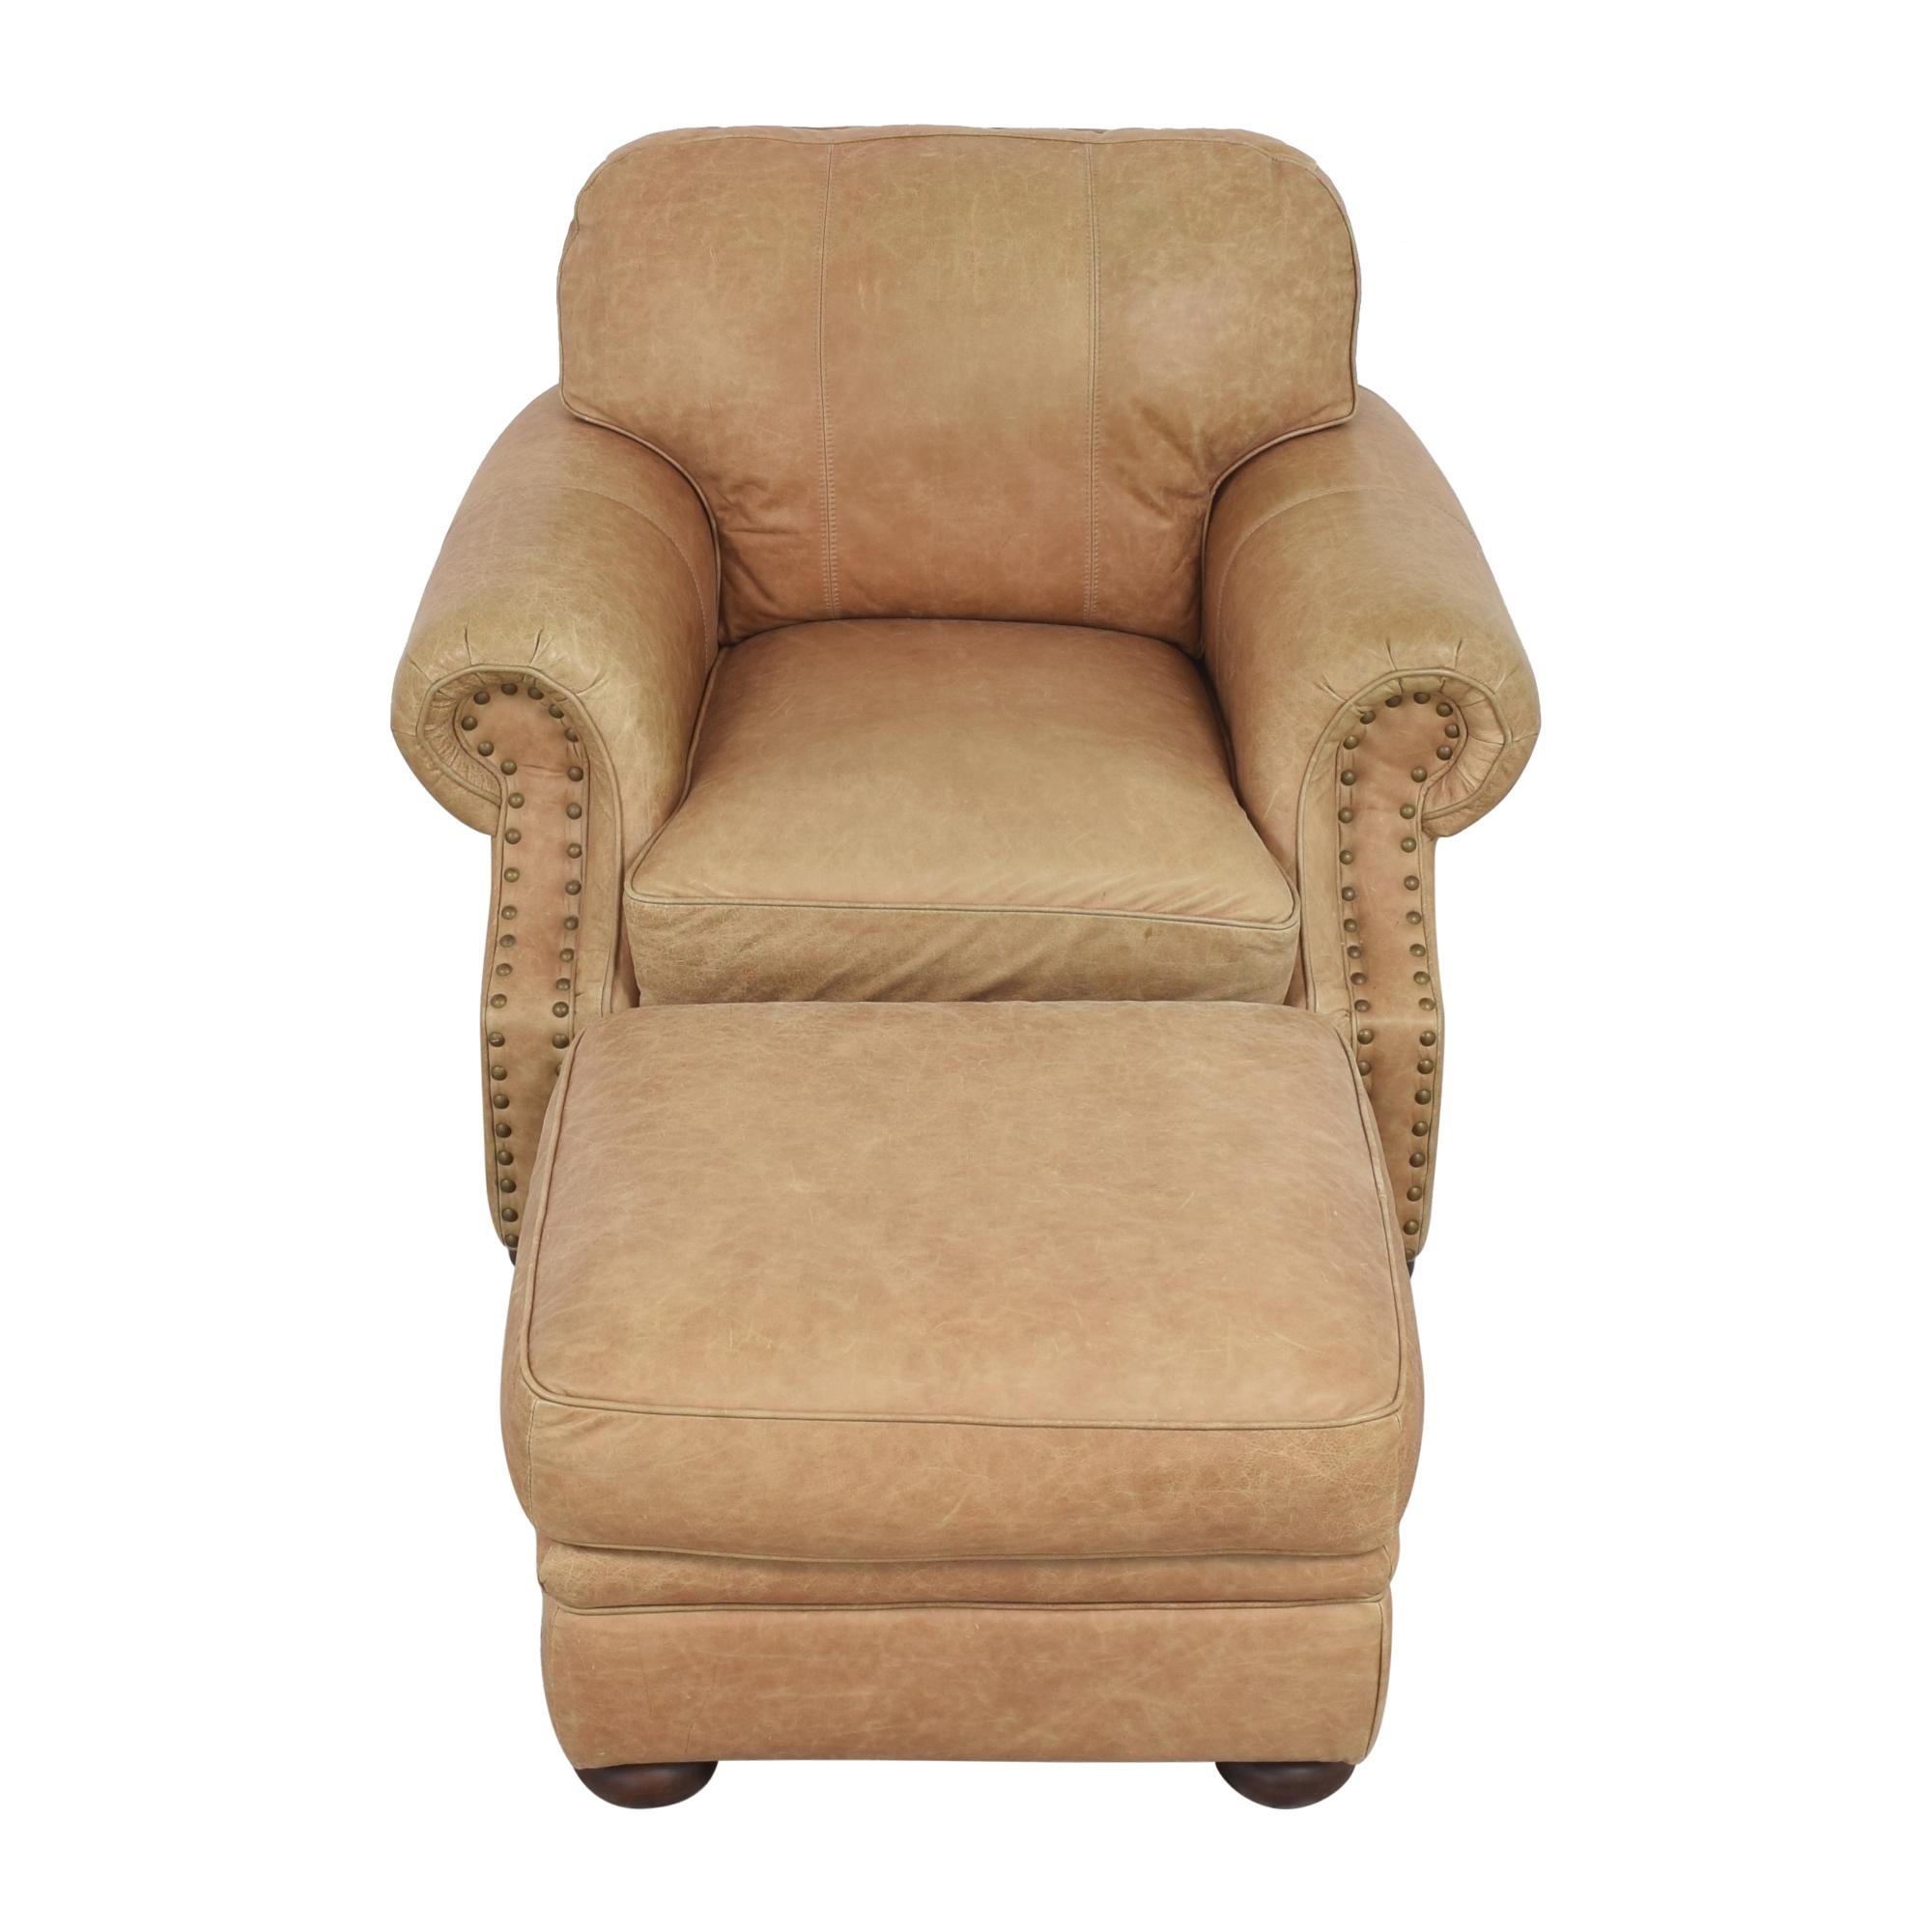 buy Ethan Allen Roll Arm Chair with Ottoman Ethan Allen